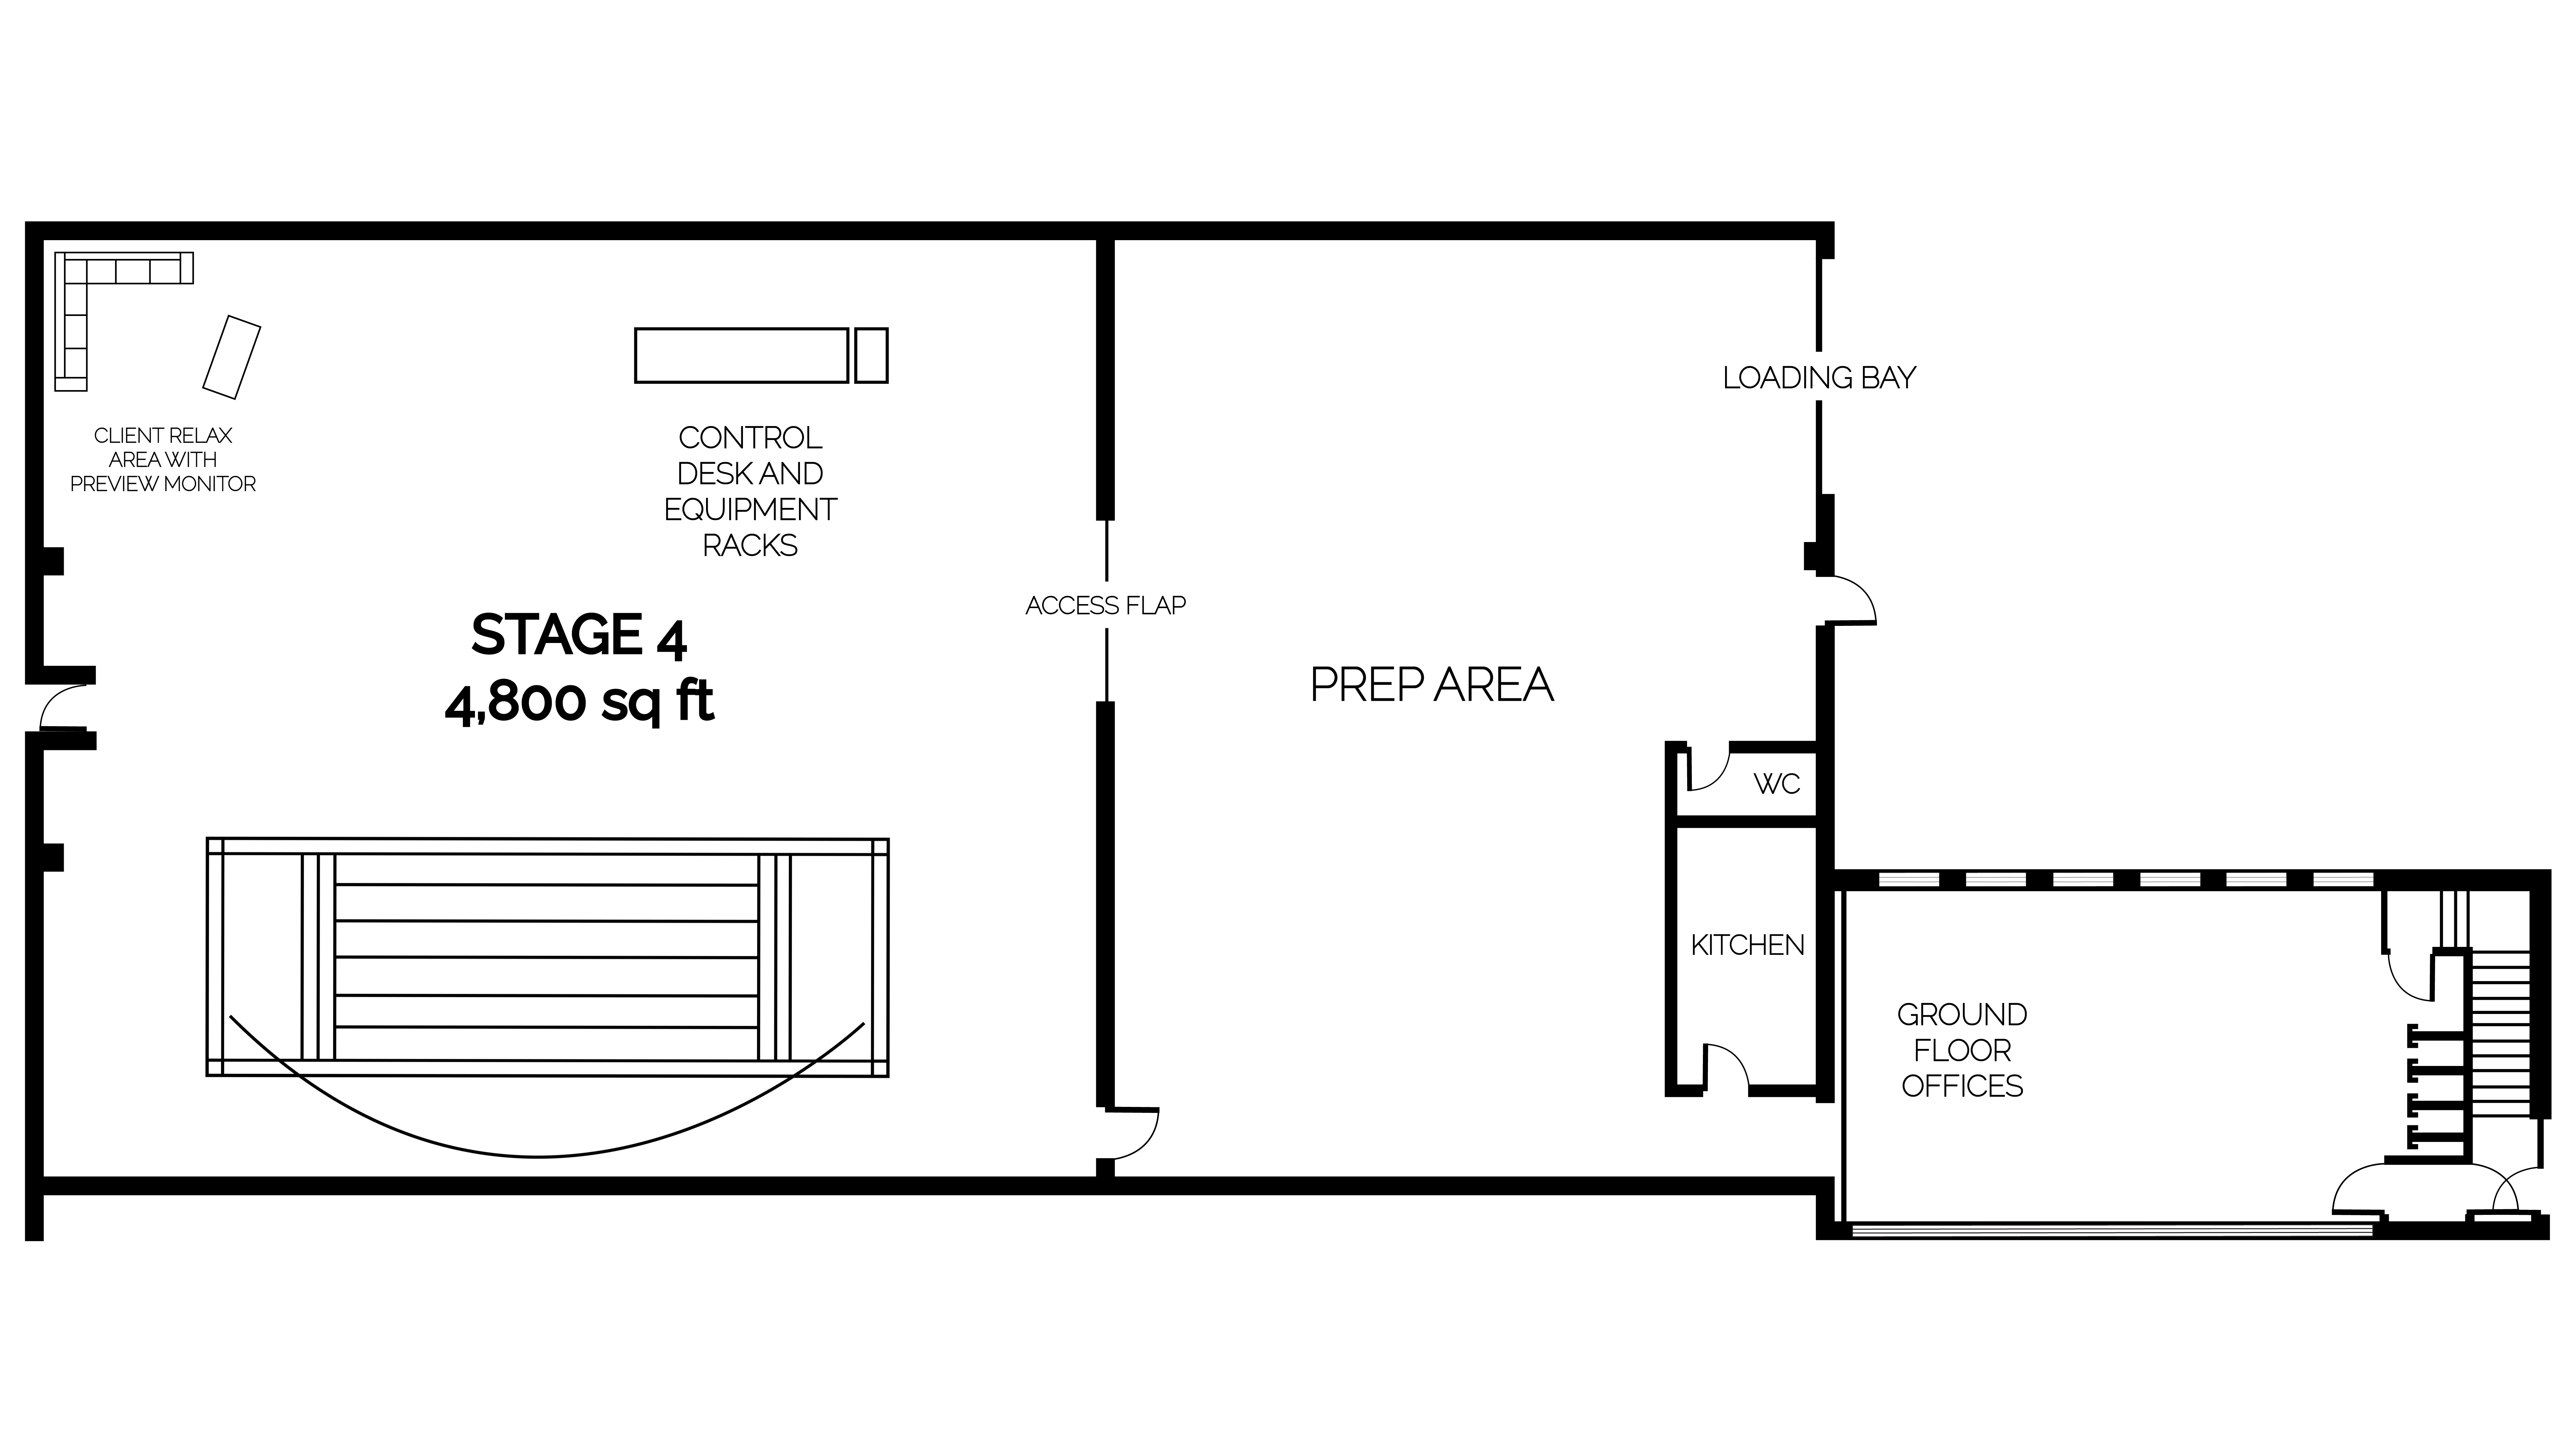 Garden Studios Stage 4 virtual production studio floor plan